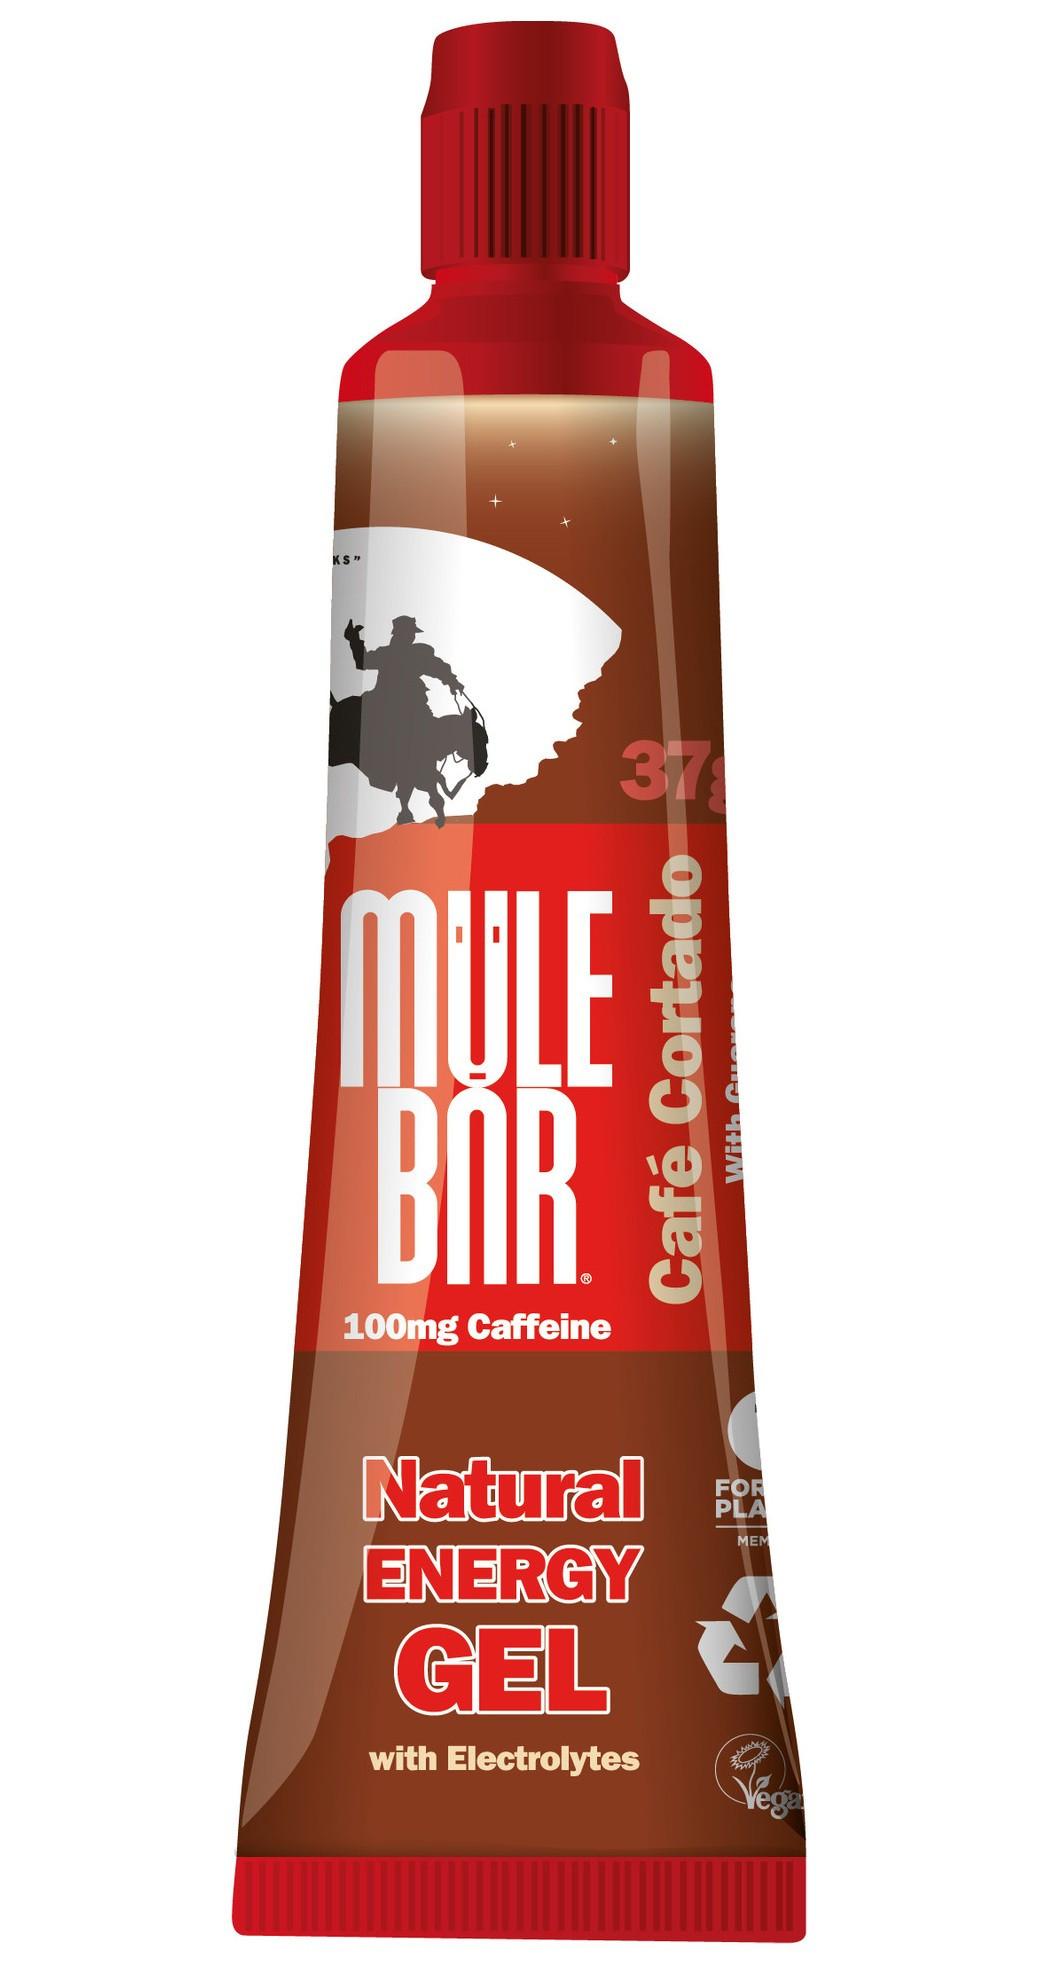 Aanbieding Mulebar Natural Energy Gel Cafe Cortado 37